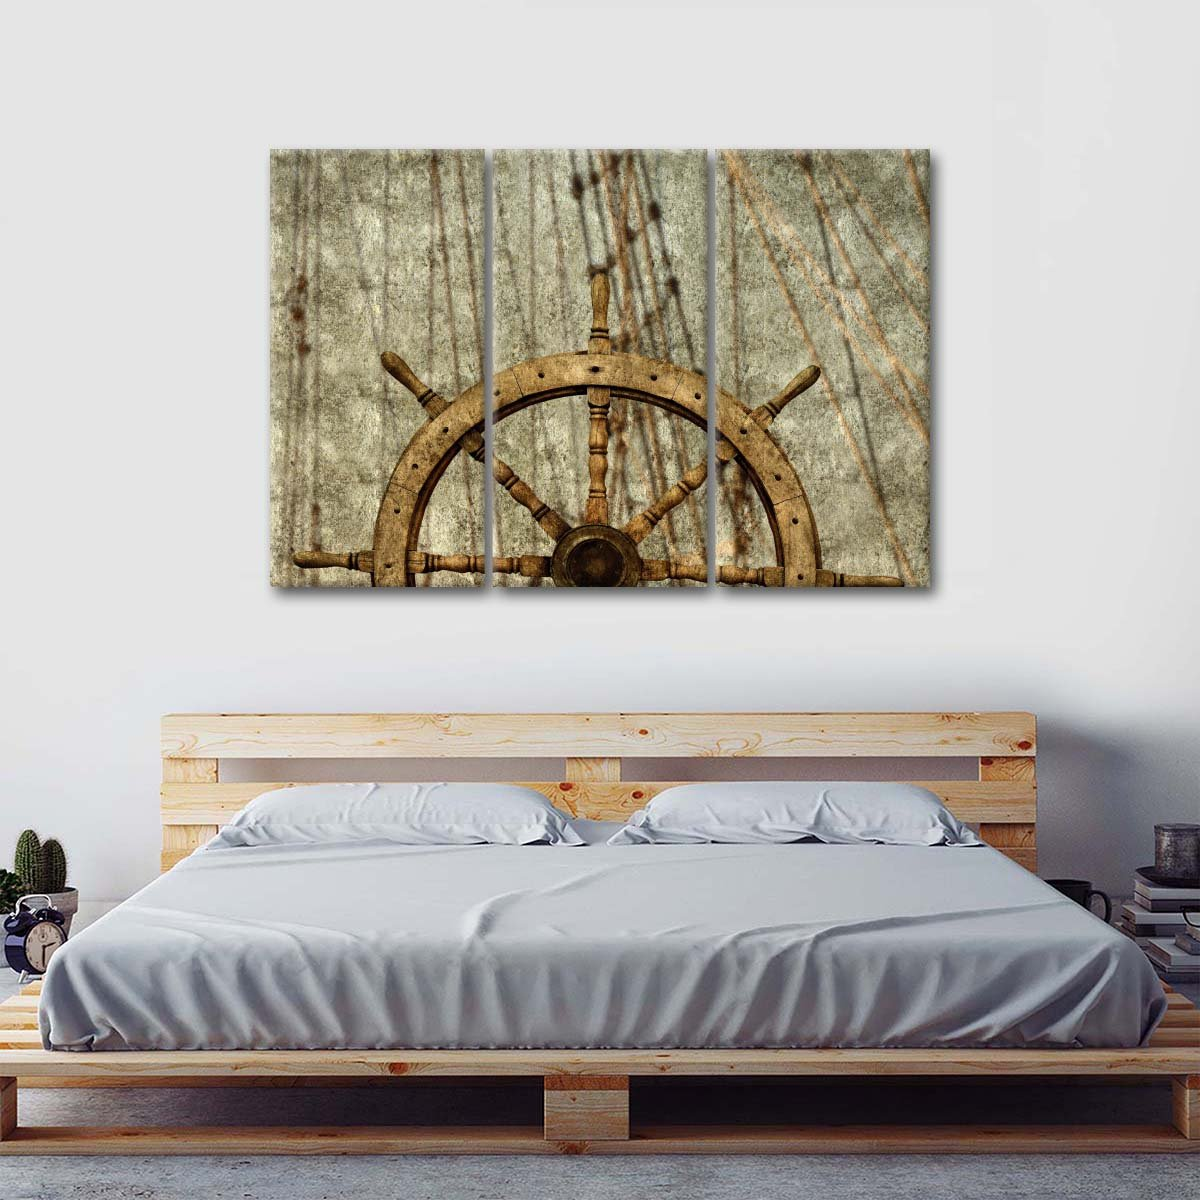 Wooden Steering Wheel Multi Panel Canvas Wall Art